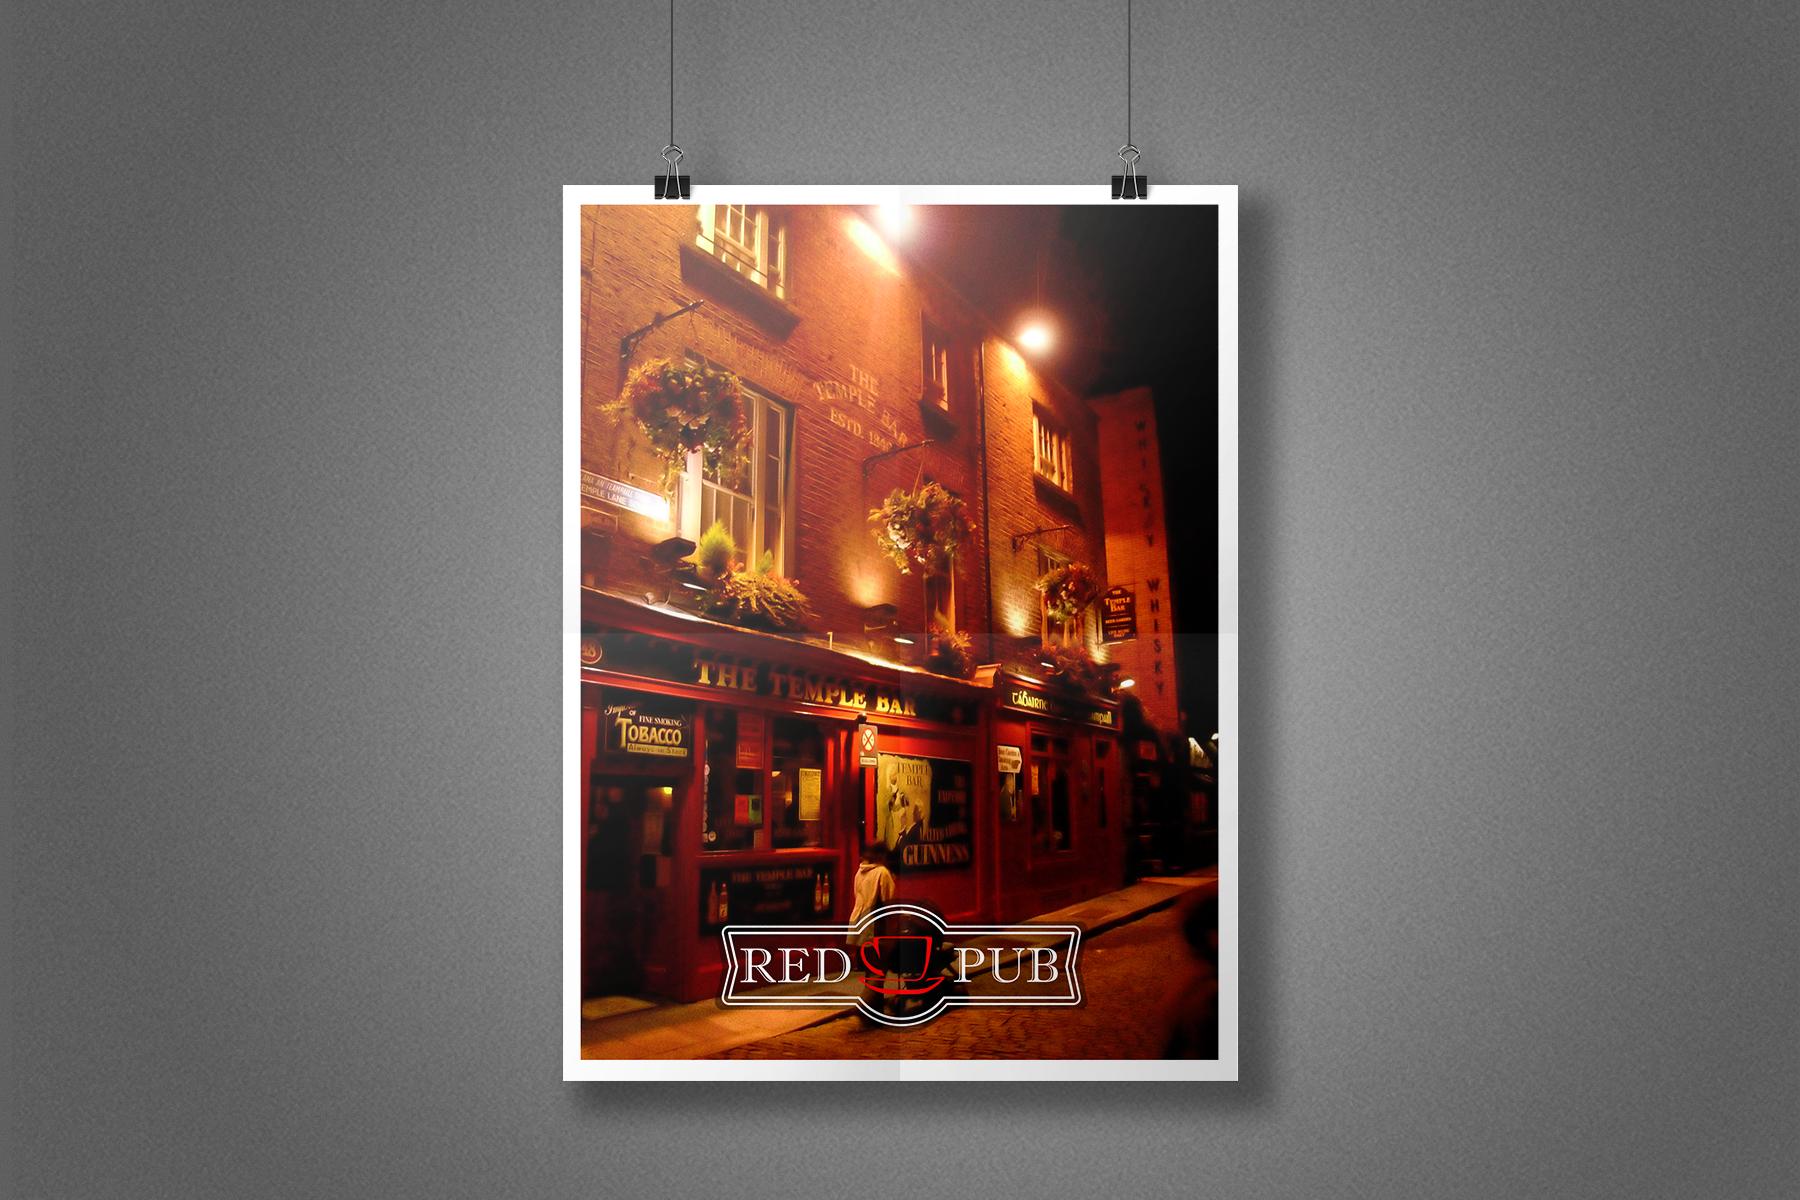 Плакат Red Cup Pub - Дублин, паб